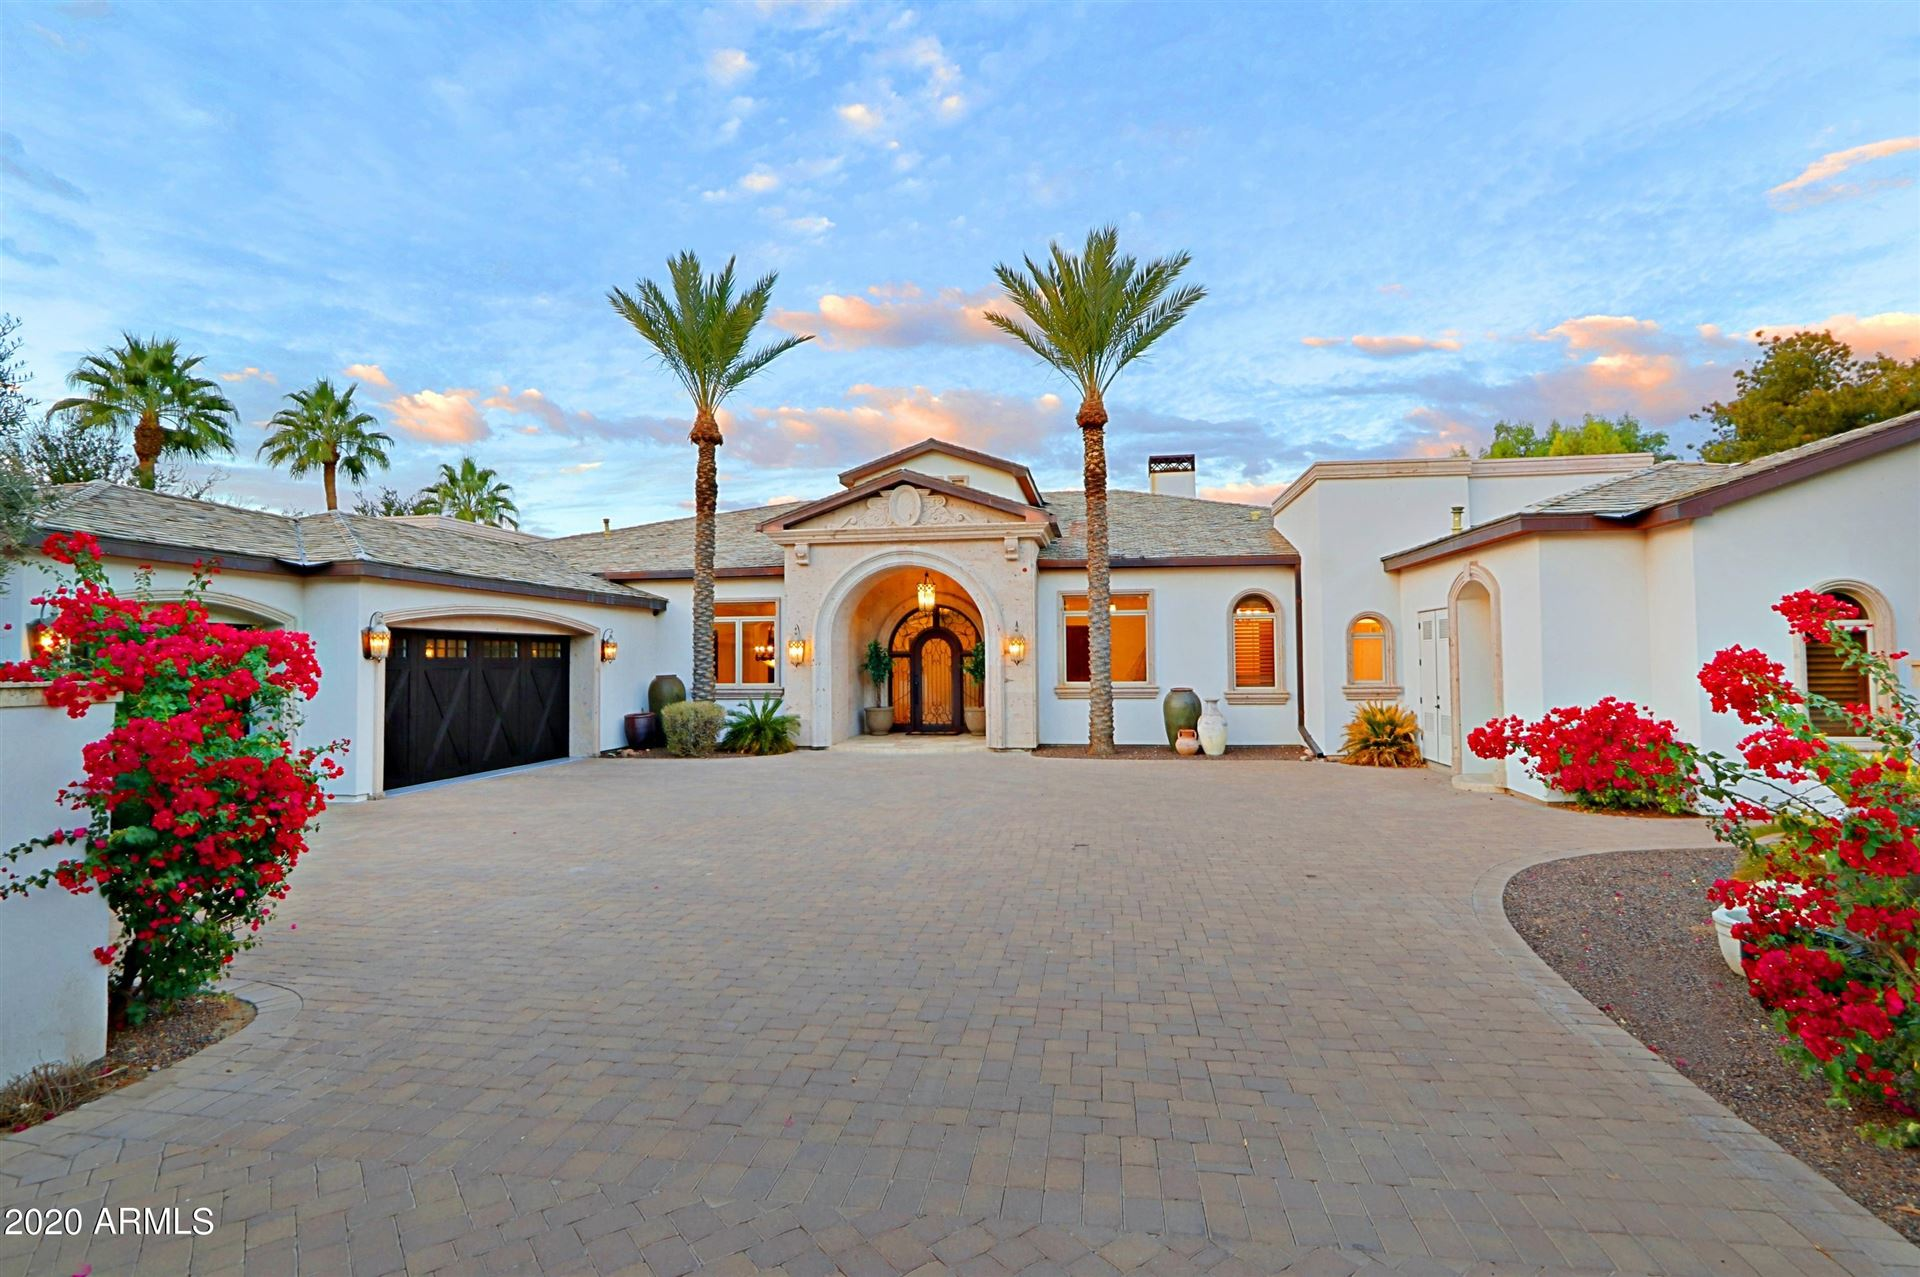 9116 N FOOTHILLS MANOR Drive, Paradise Valley, AZ 85253 - MLS#: 6175458